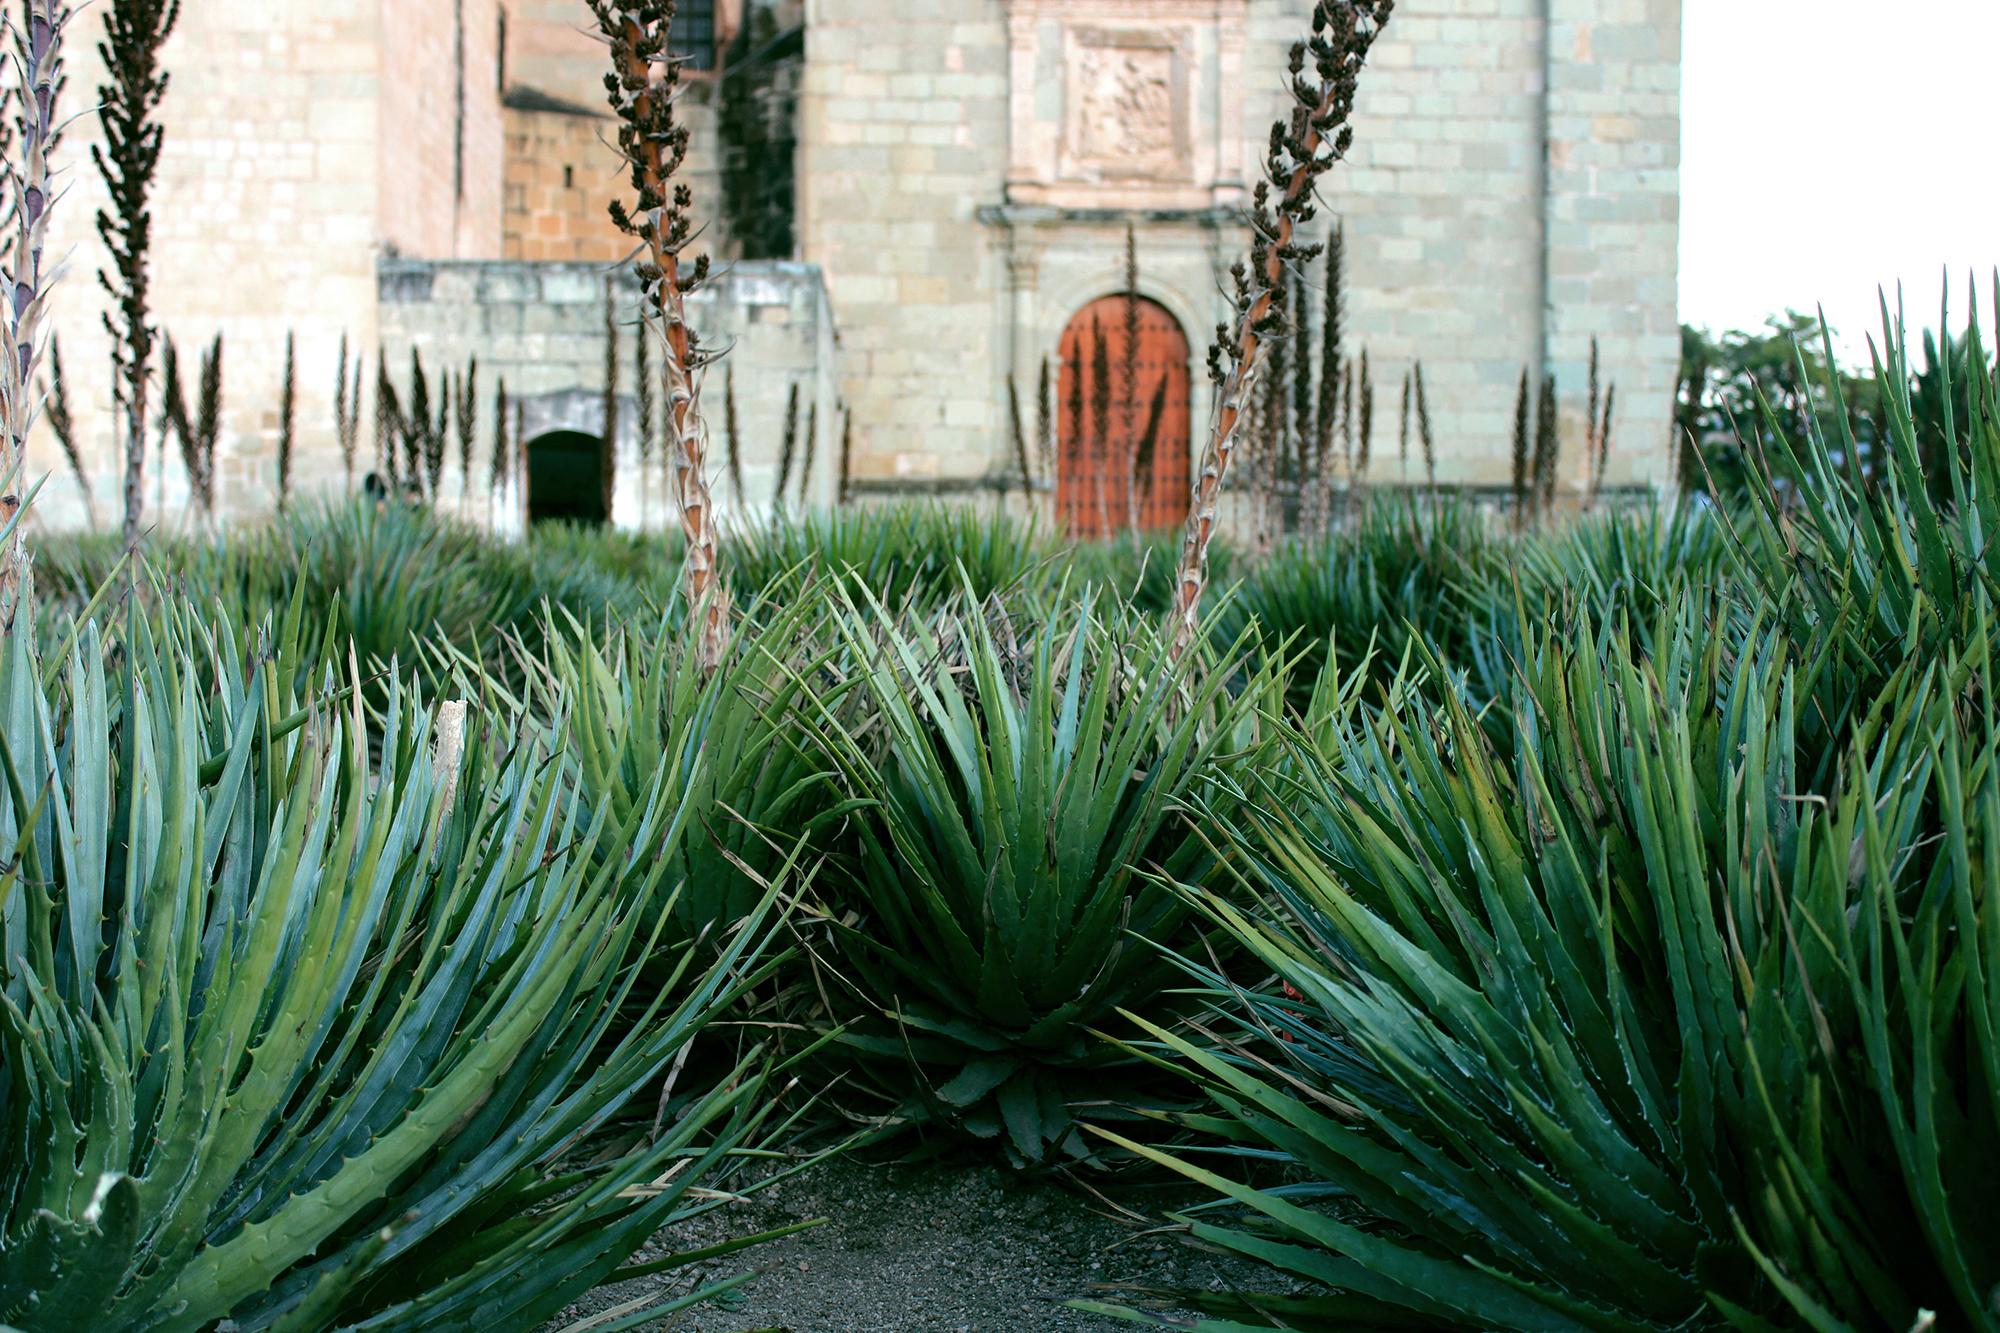 Church of Santo Domingo in Oaxaca City. Photo by Norma Contreras (Unsplash).